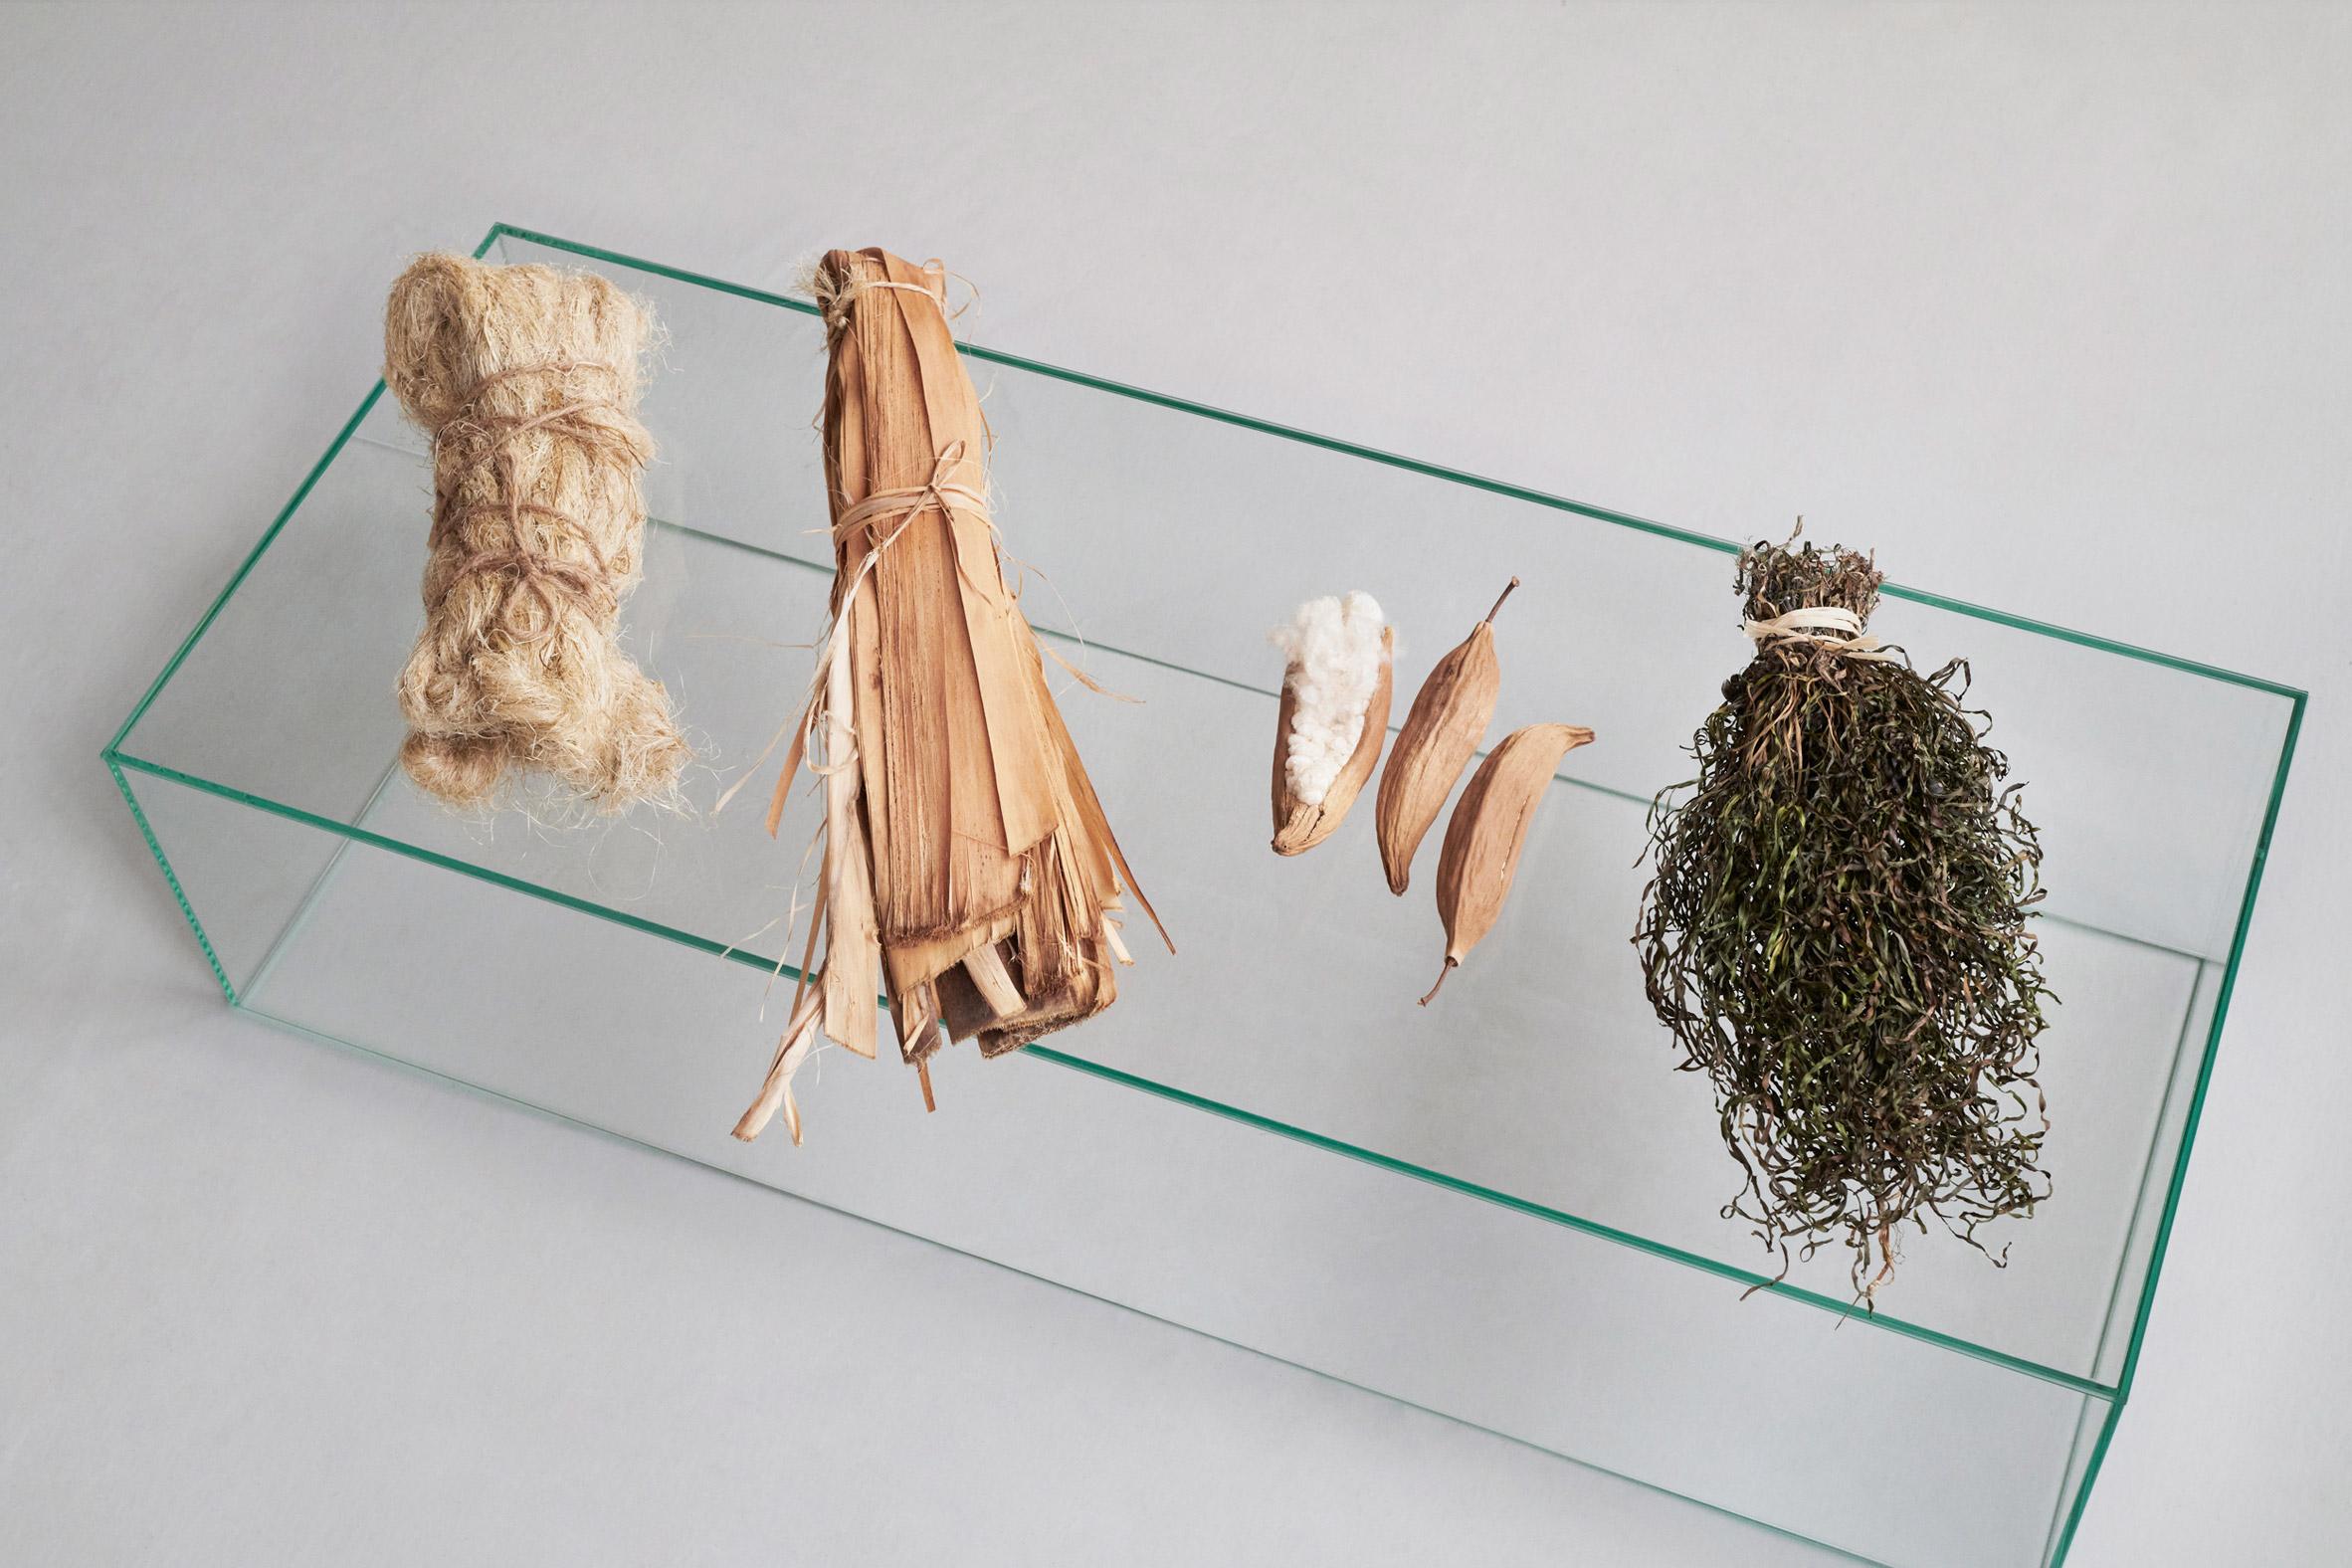 Phytophilia by Sara Martinsen